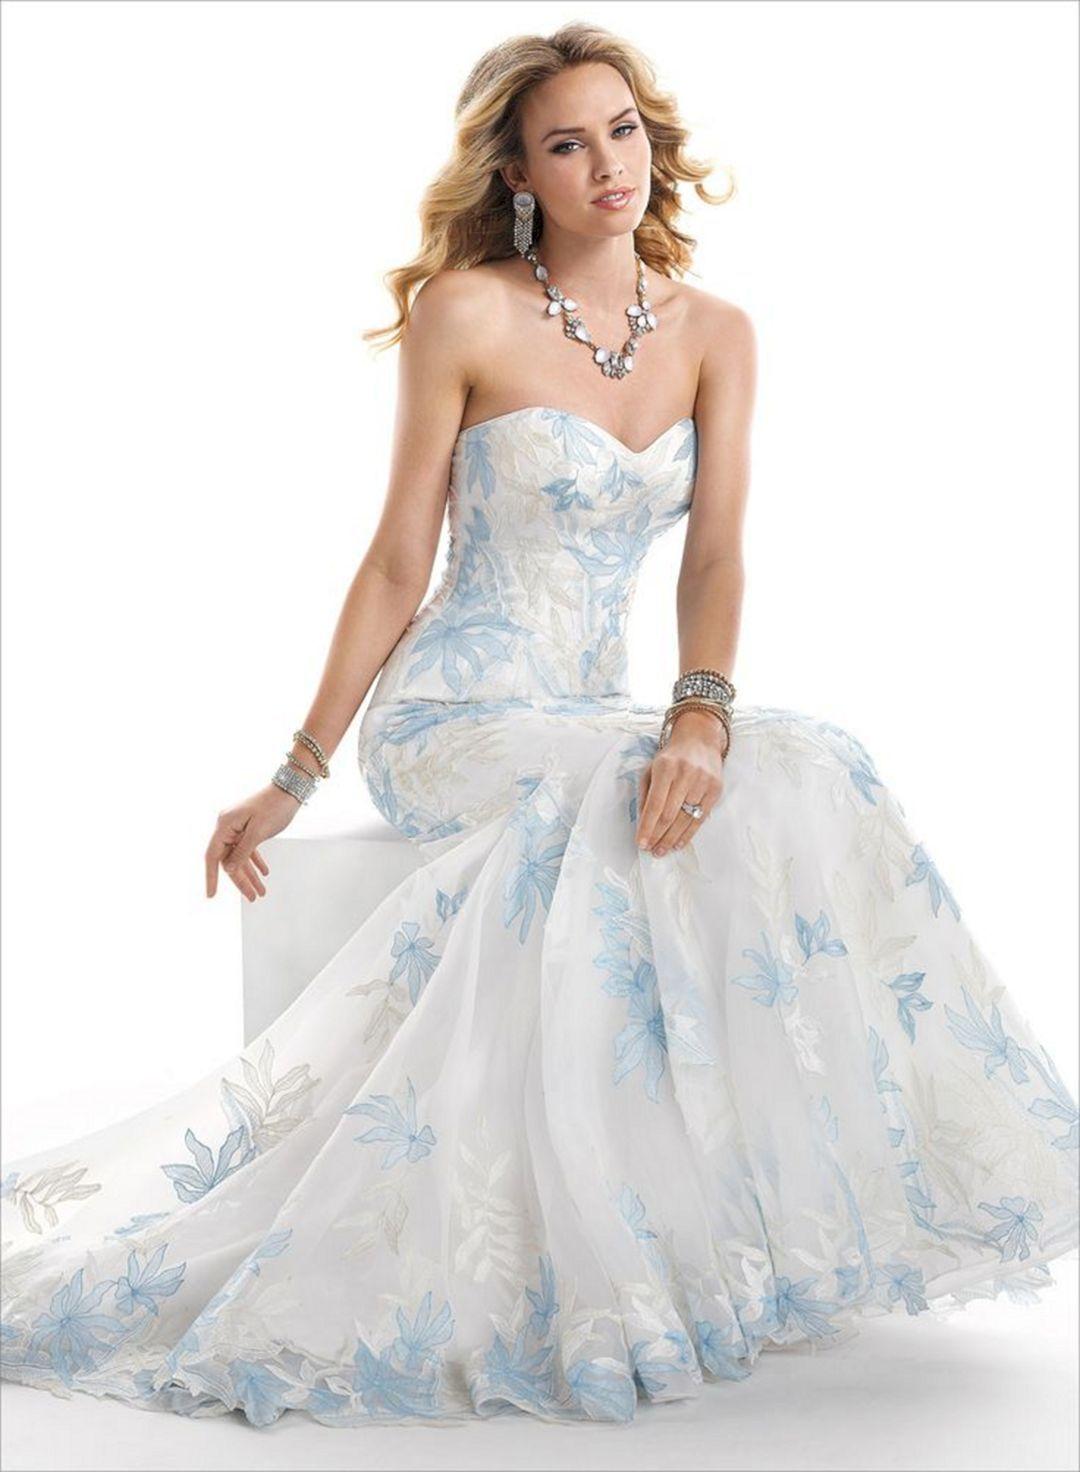 20 beautiful blue and white wedding dress style ideas wedding dresses blue lace wedding dress colored wedding dresses